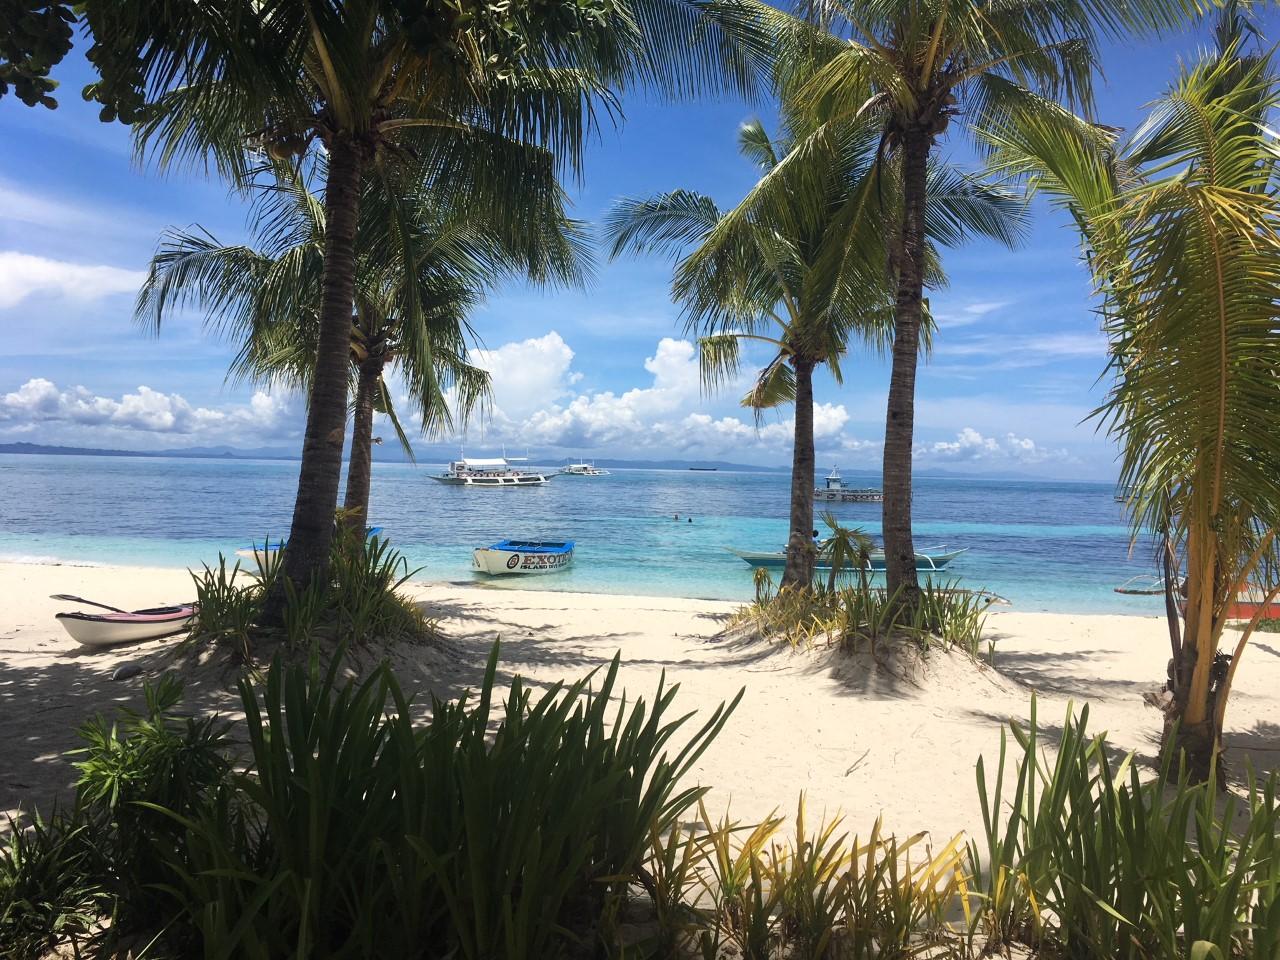 Philippines beach